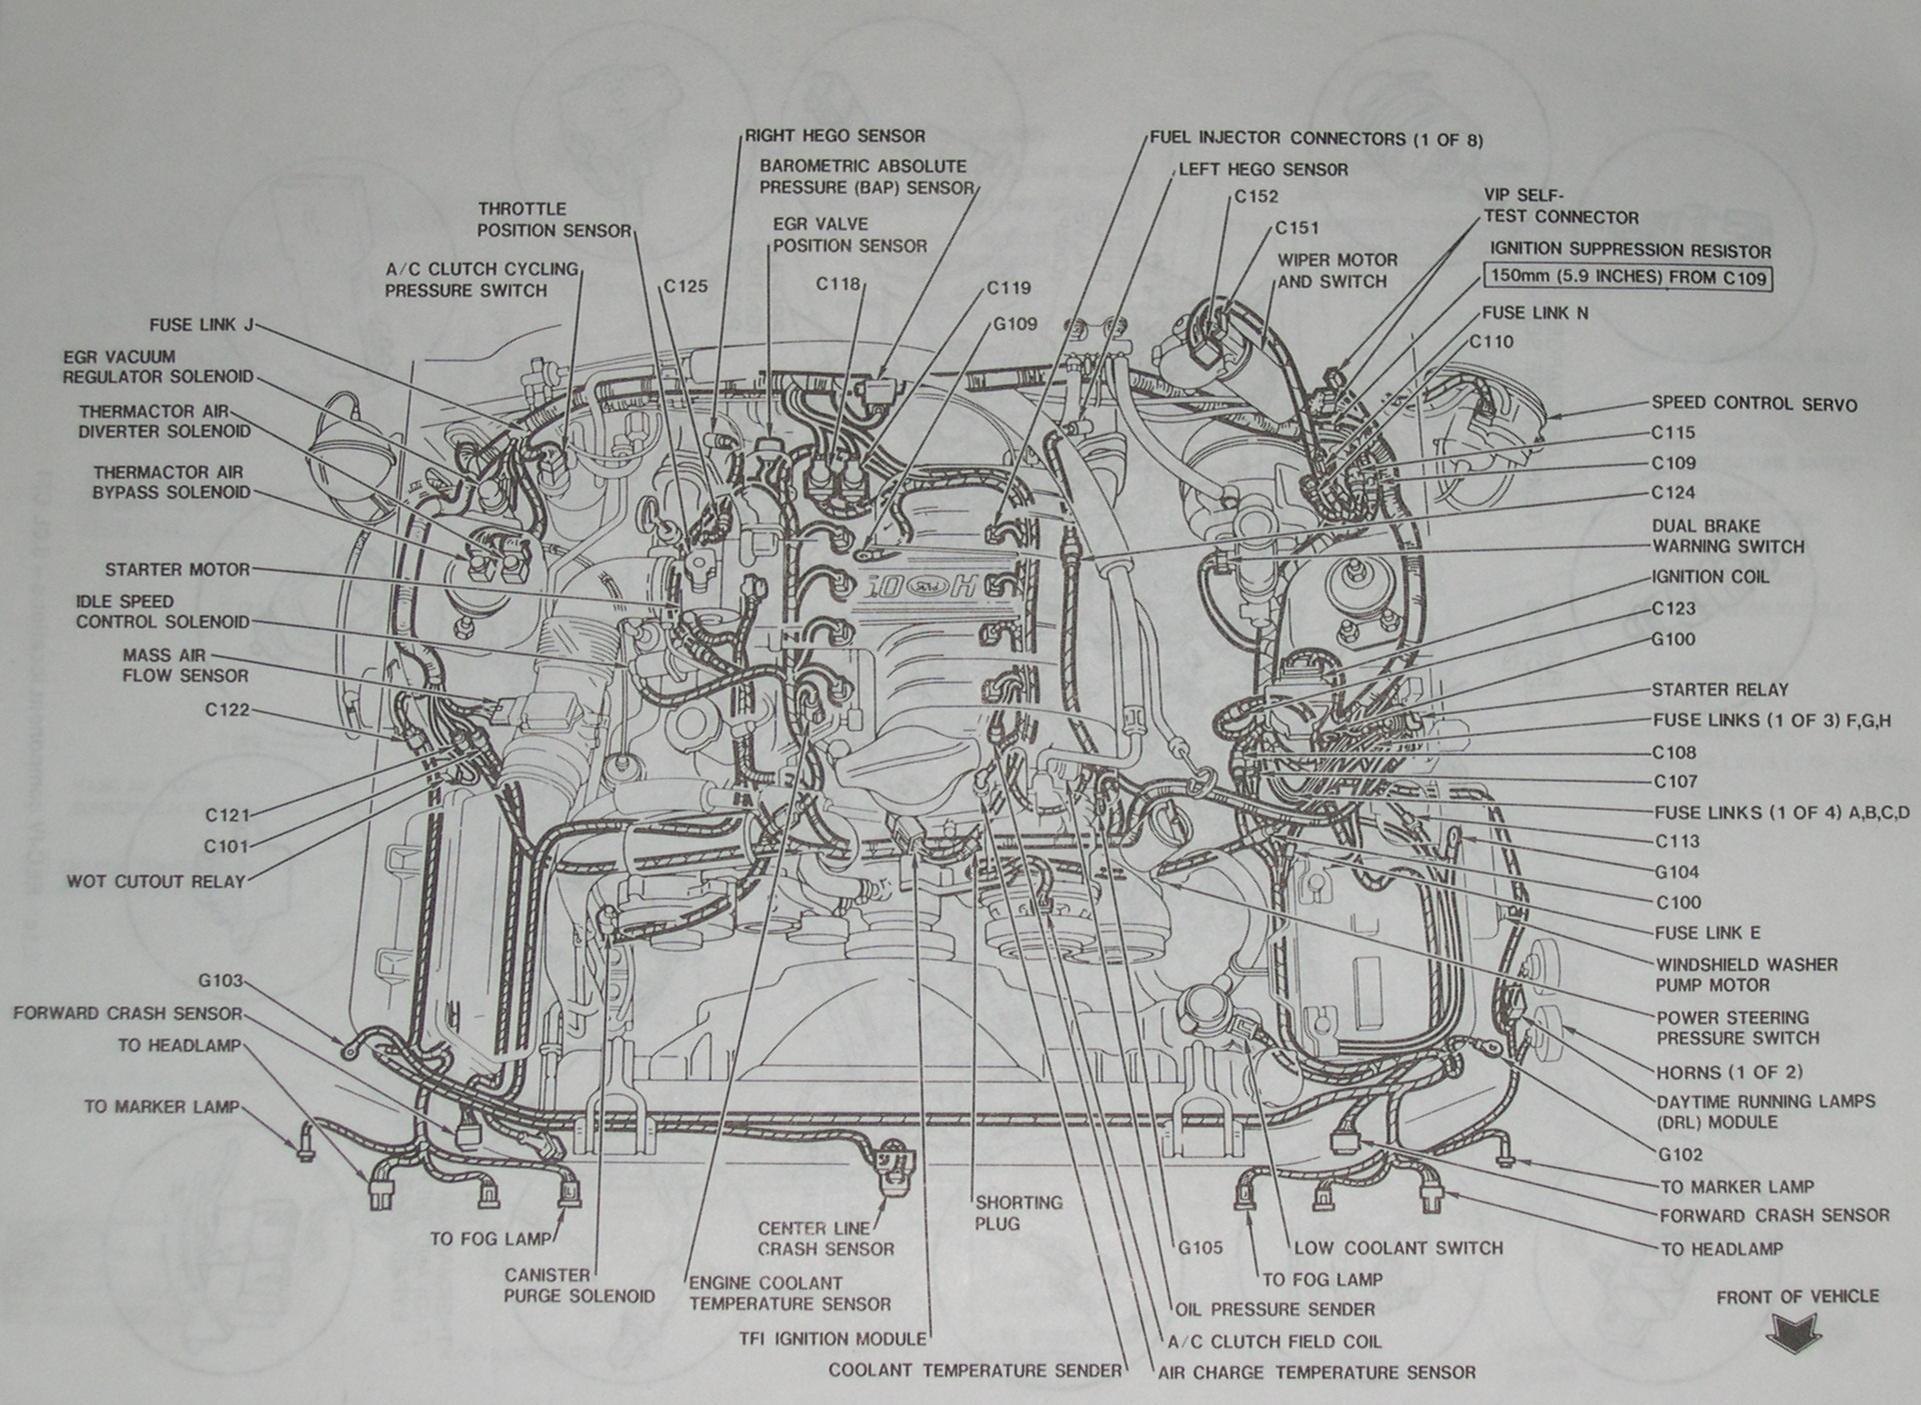 Ford Mustang 302 Alternator Wiring Harnes Diagram